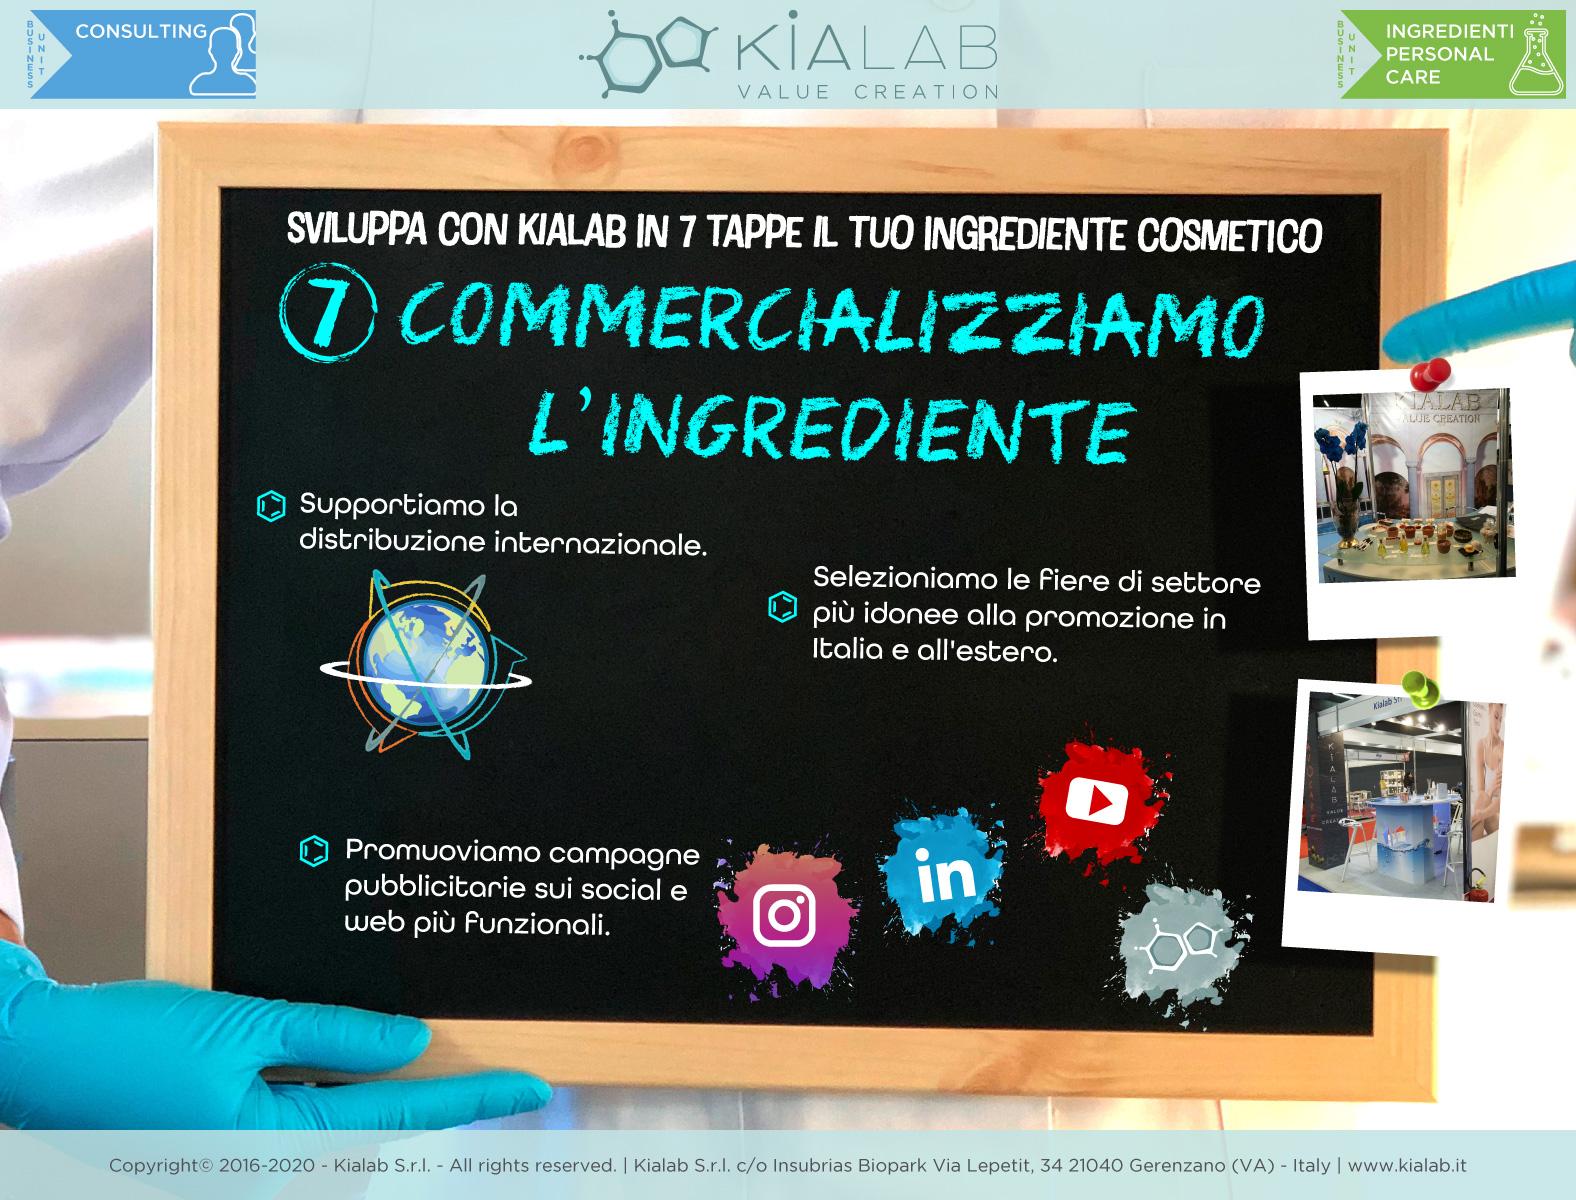 Scouting Ricerca Kialab Sviluppo di Ingredienti Innovativi